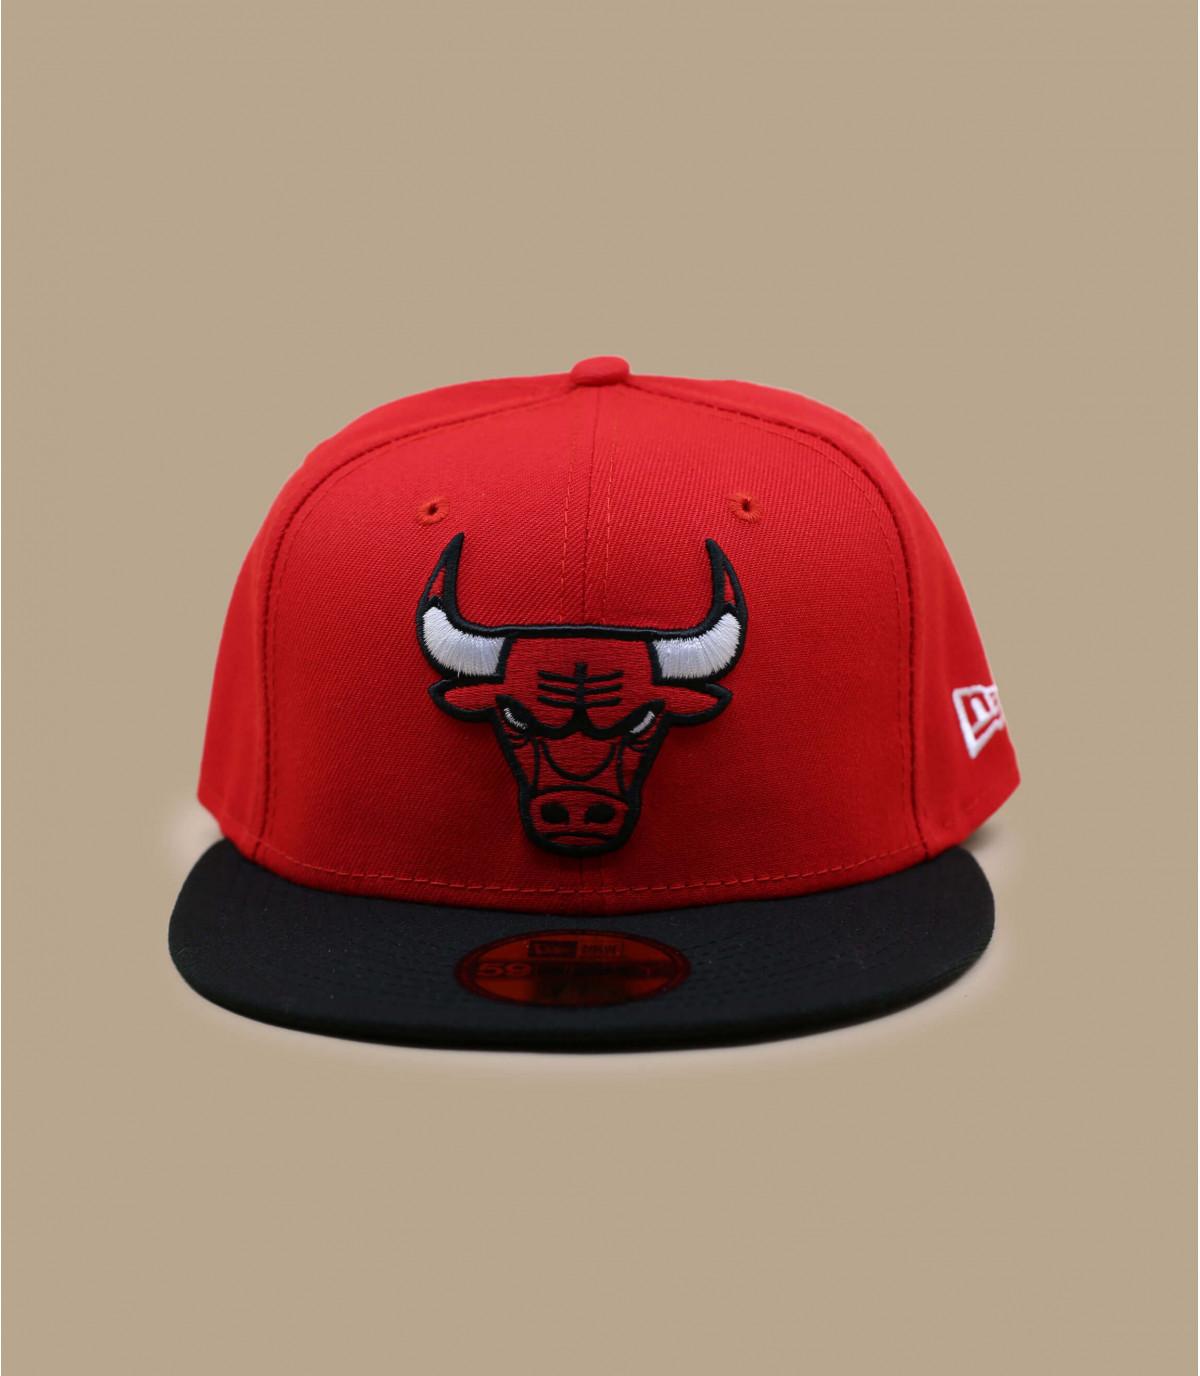 Casquette nba bulls